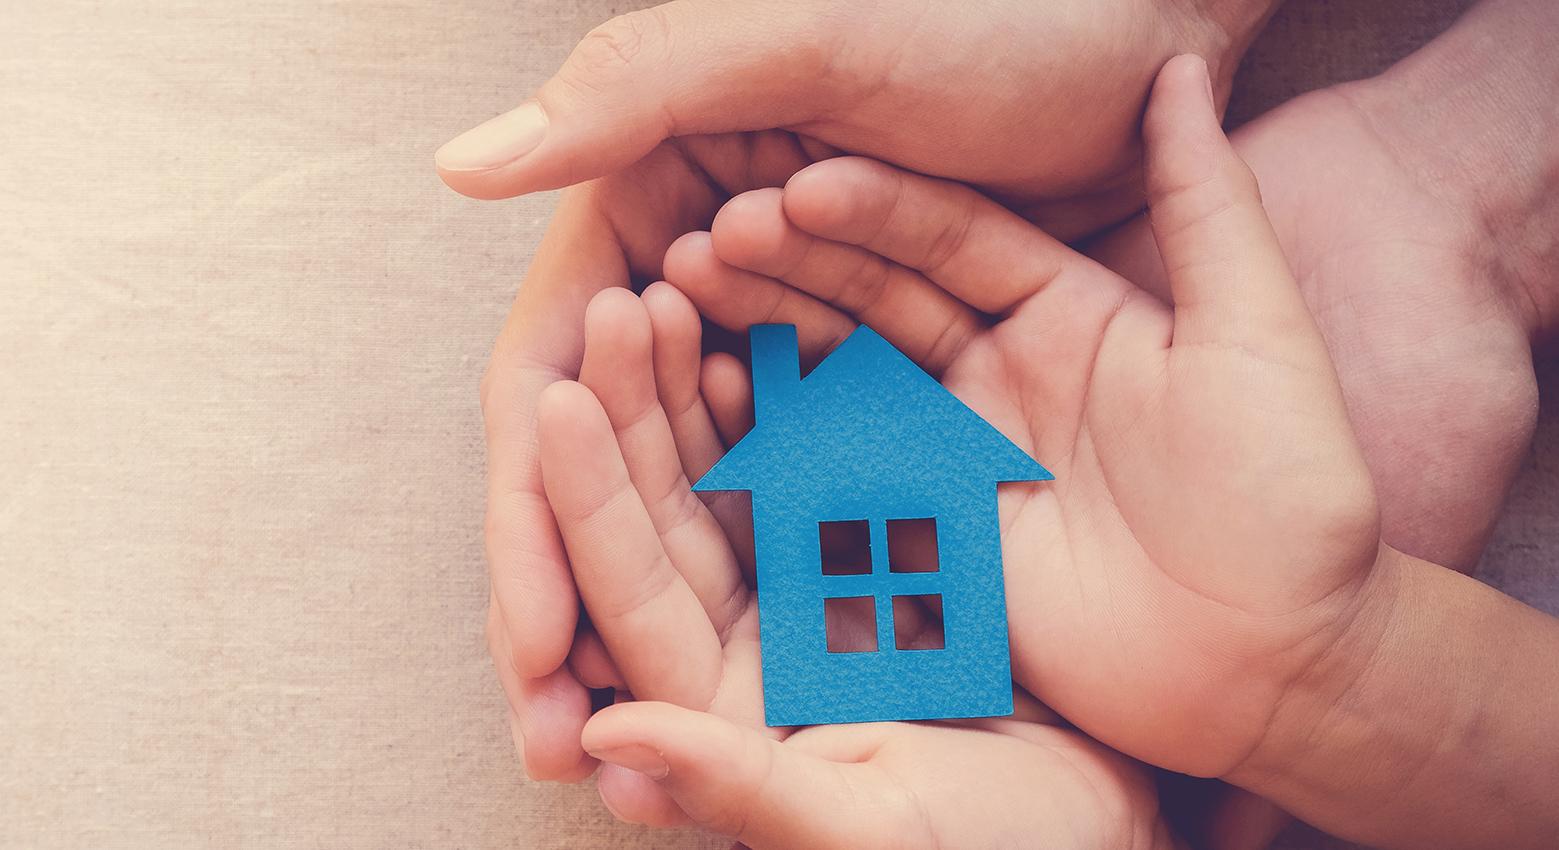 hands holding paper house, family home, homeless shelter, intern